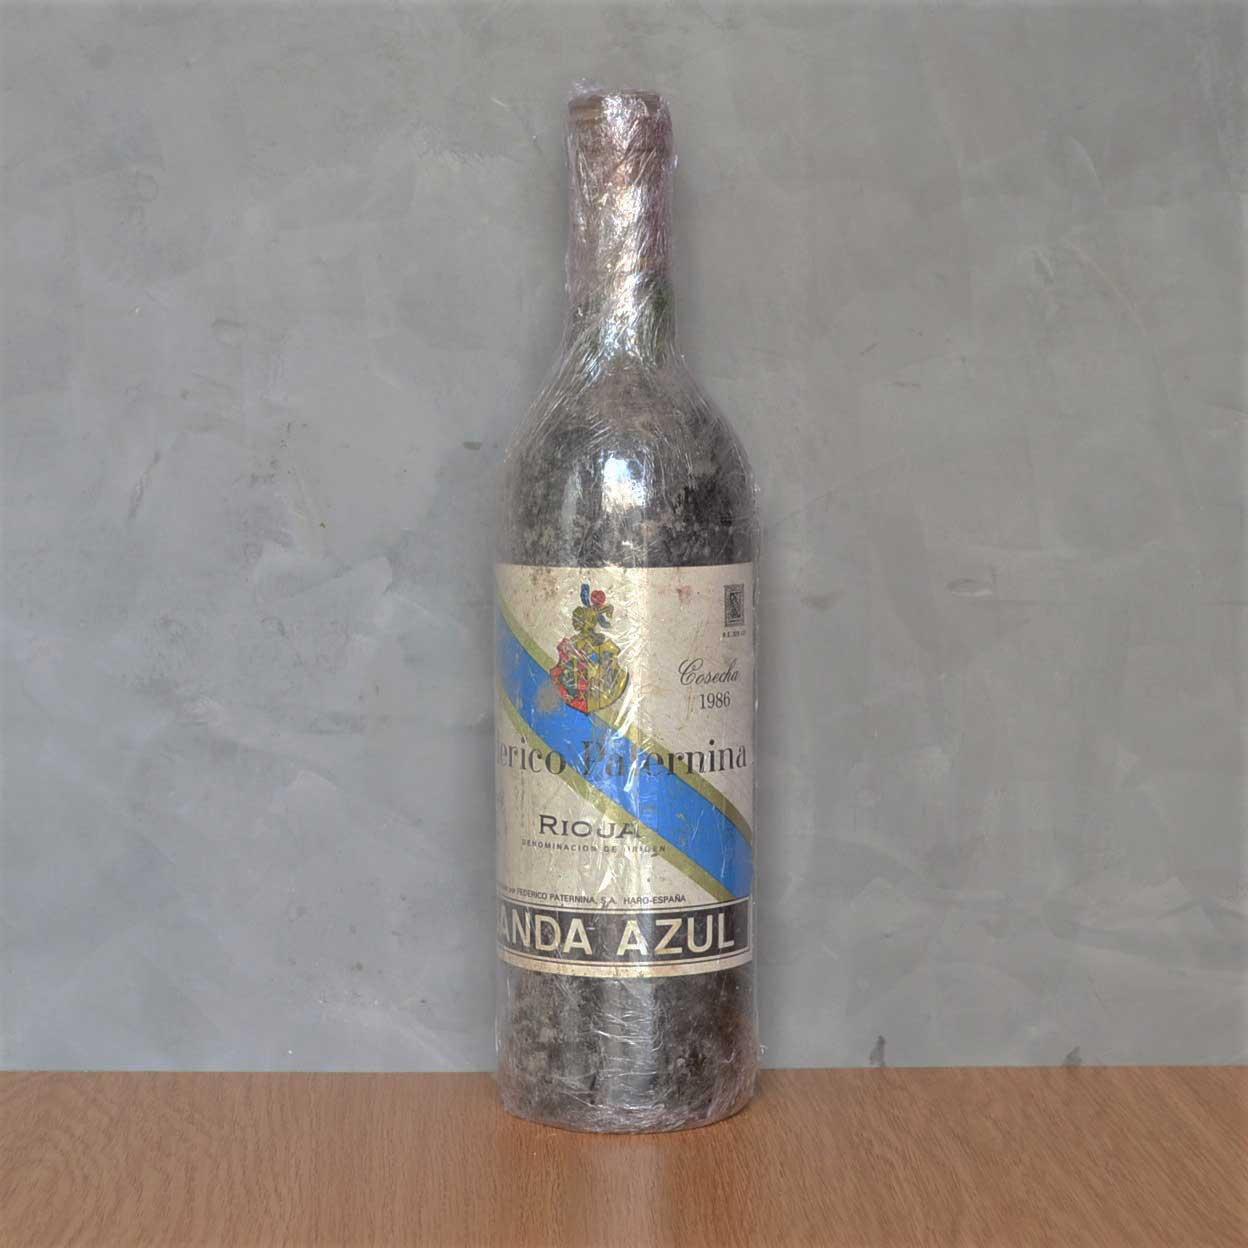 Paternina banda azul 1986